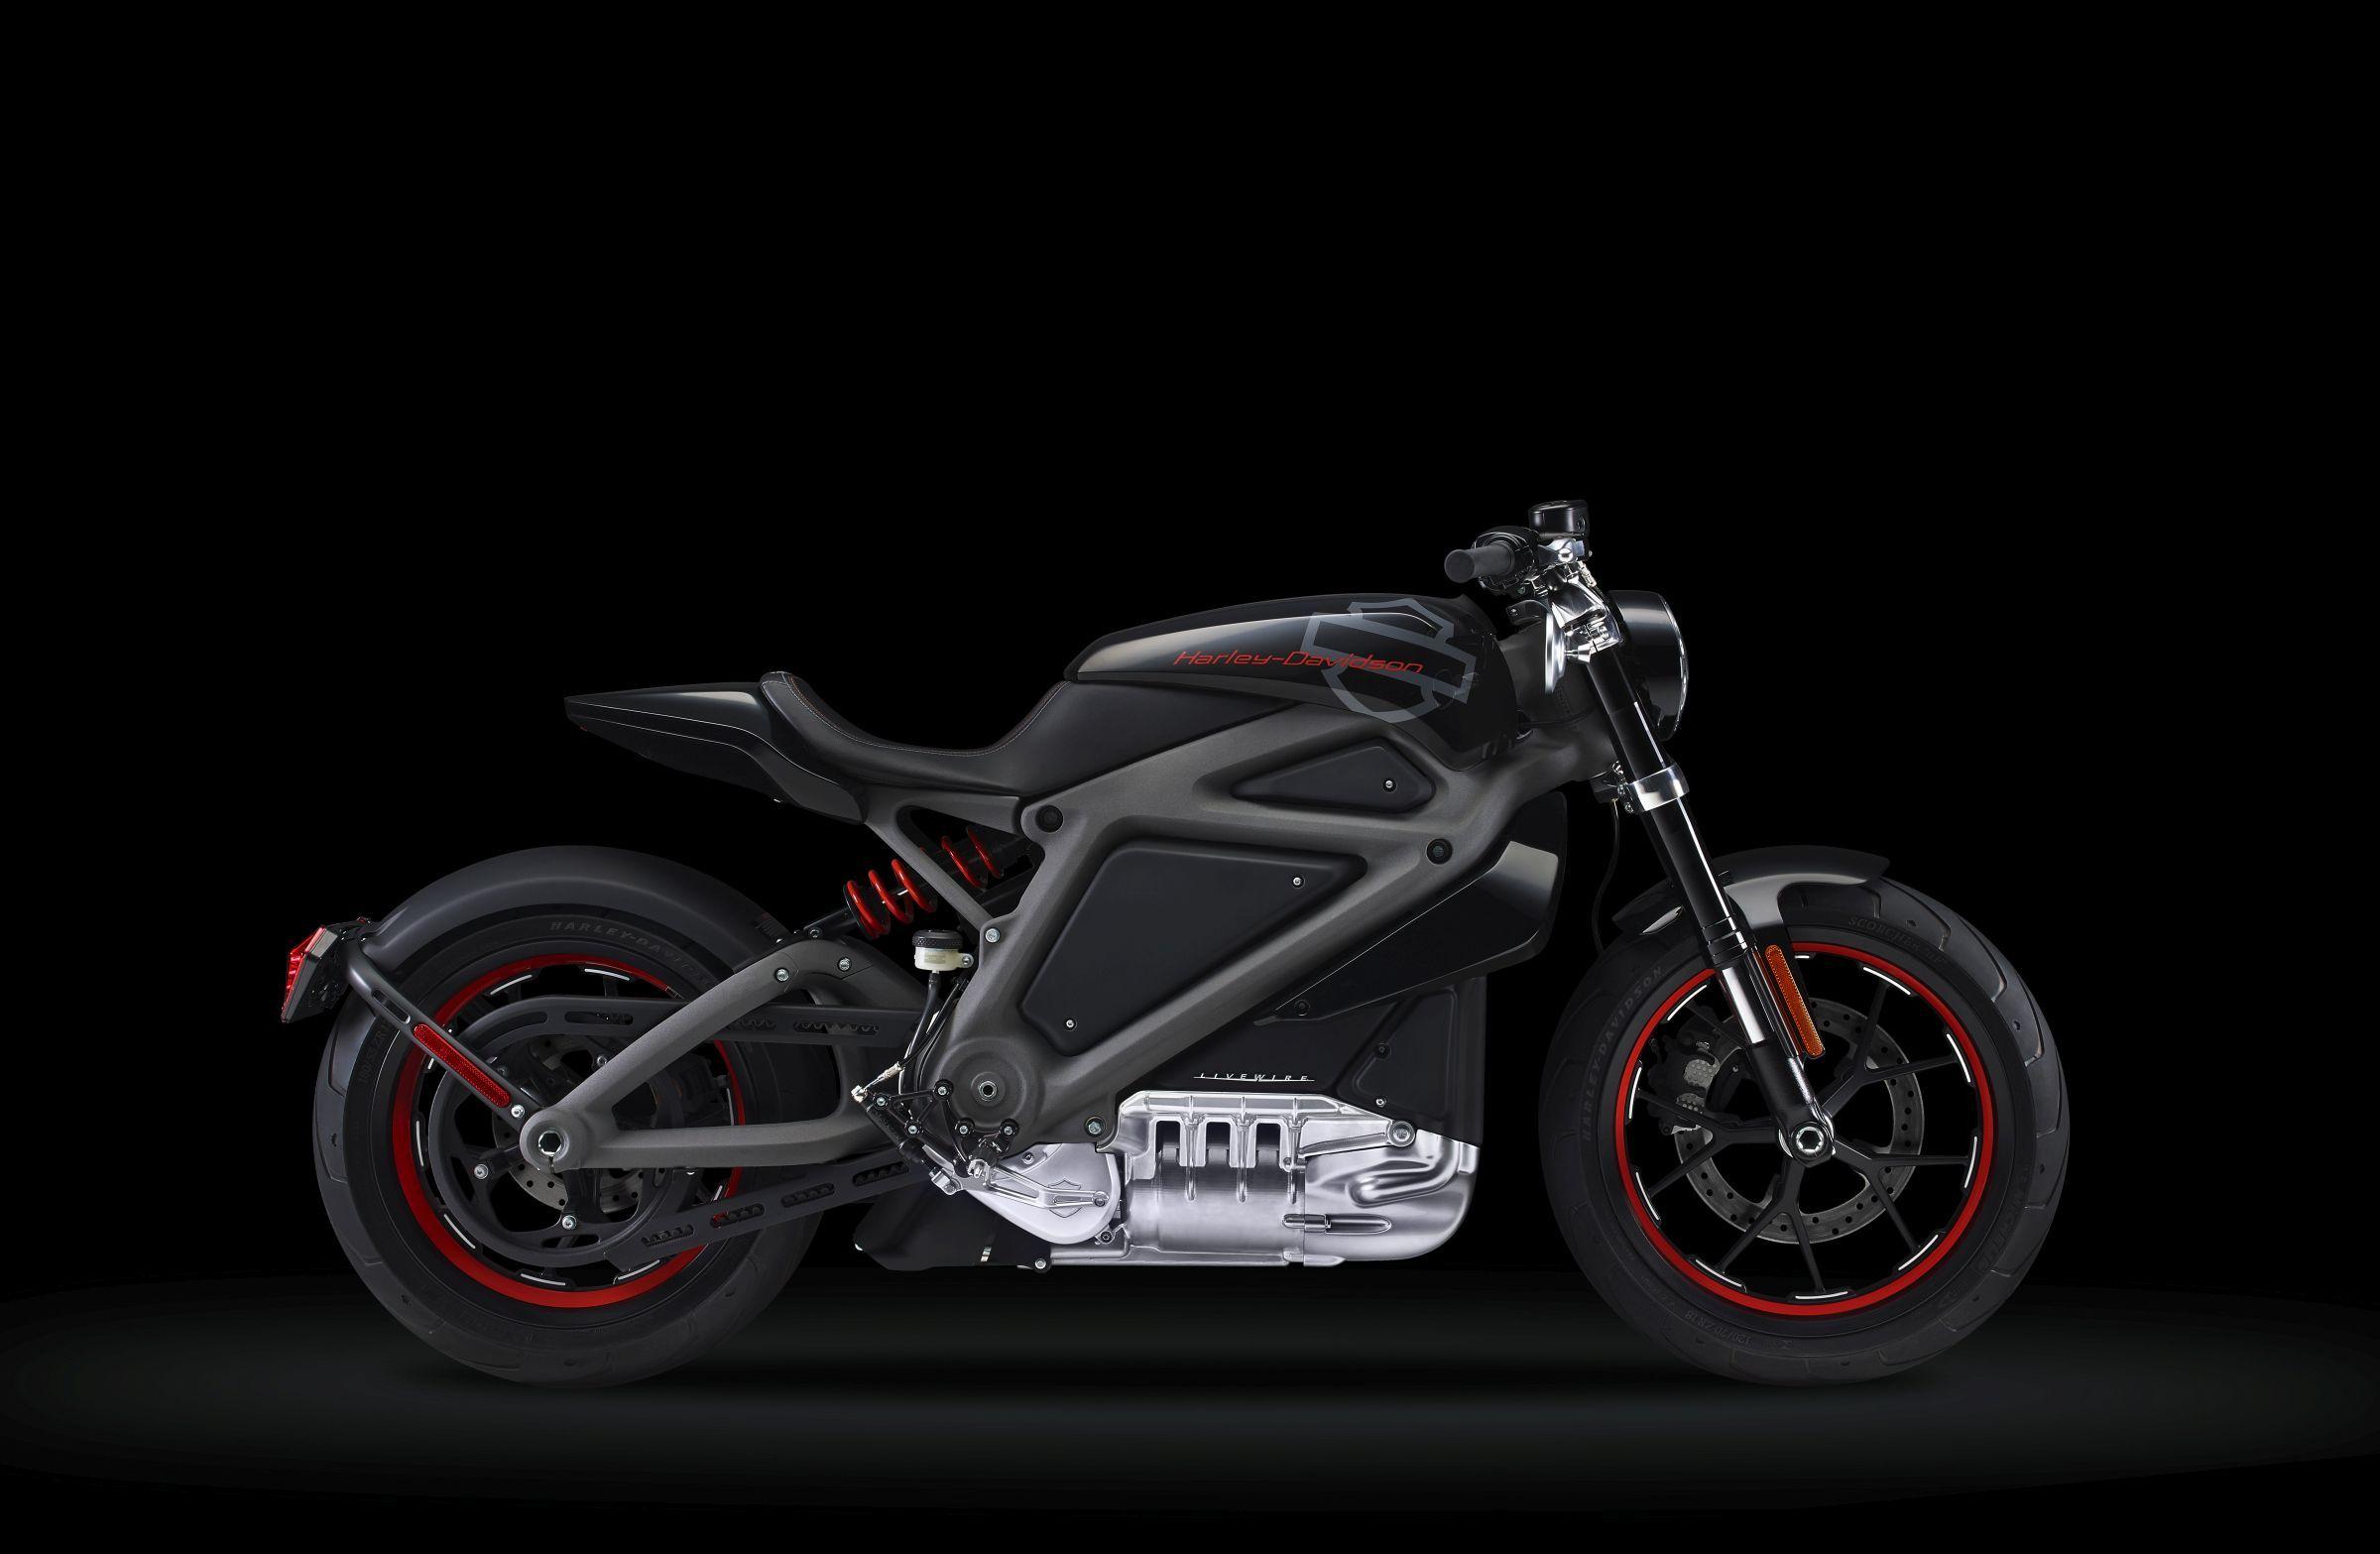 Электрический мотоцикл LiveWire. Фото: harley-davidson.com